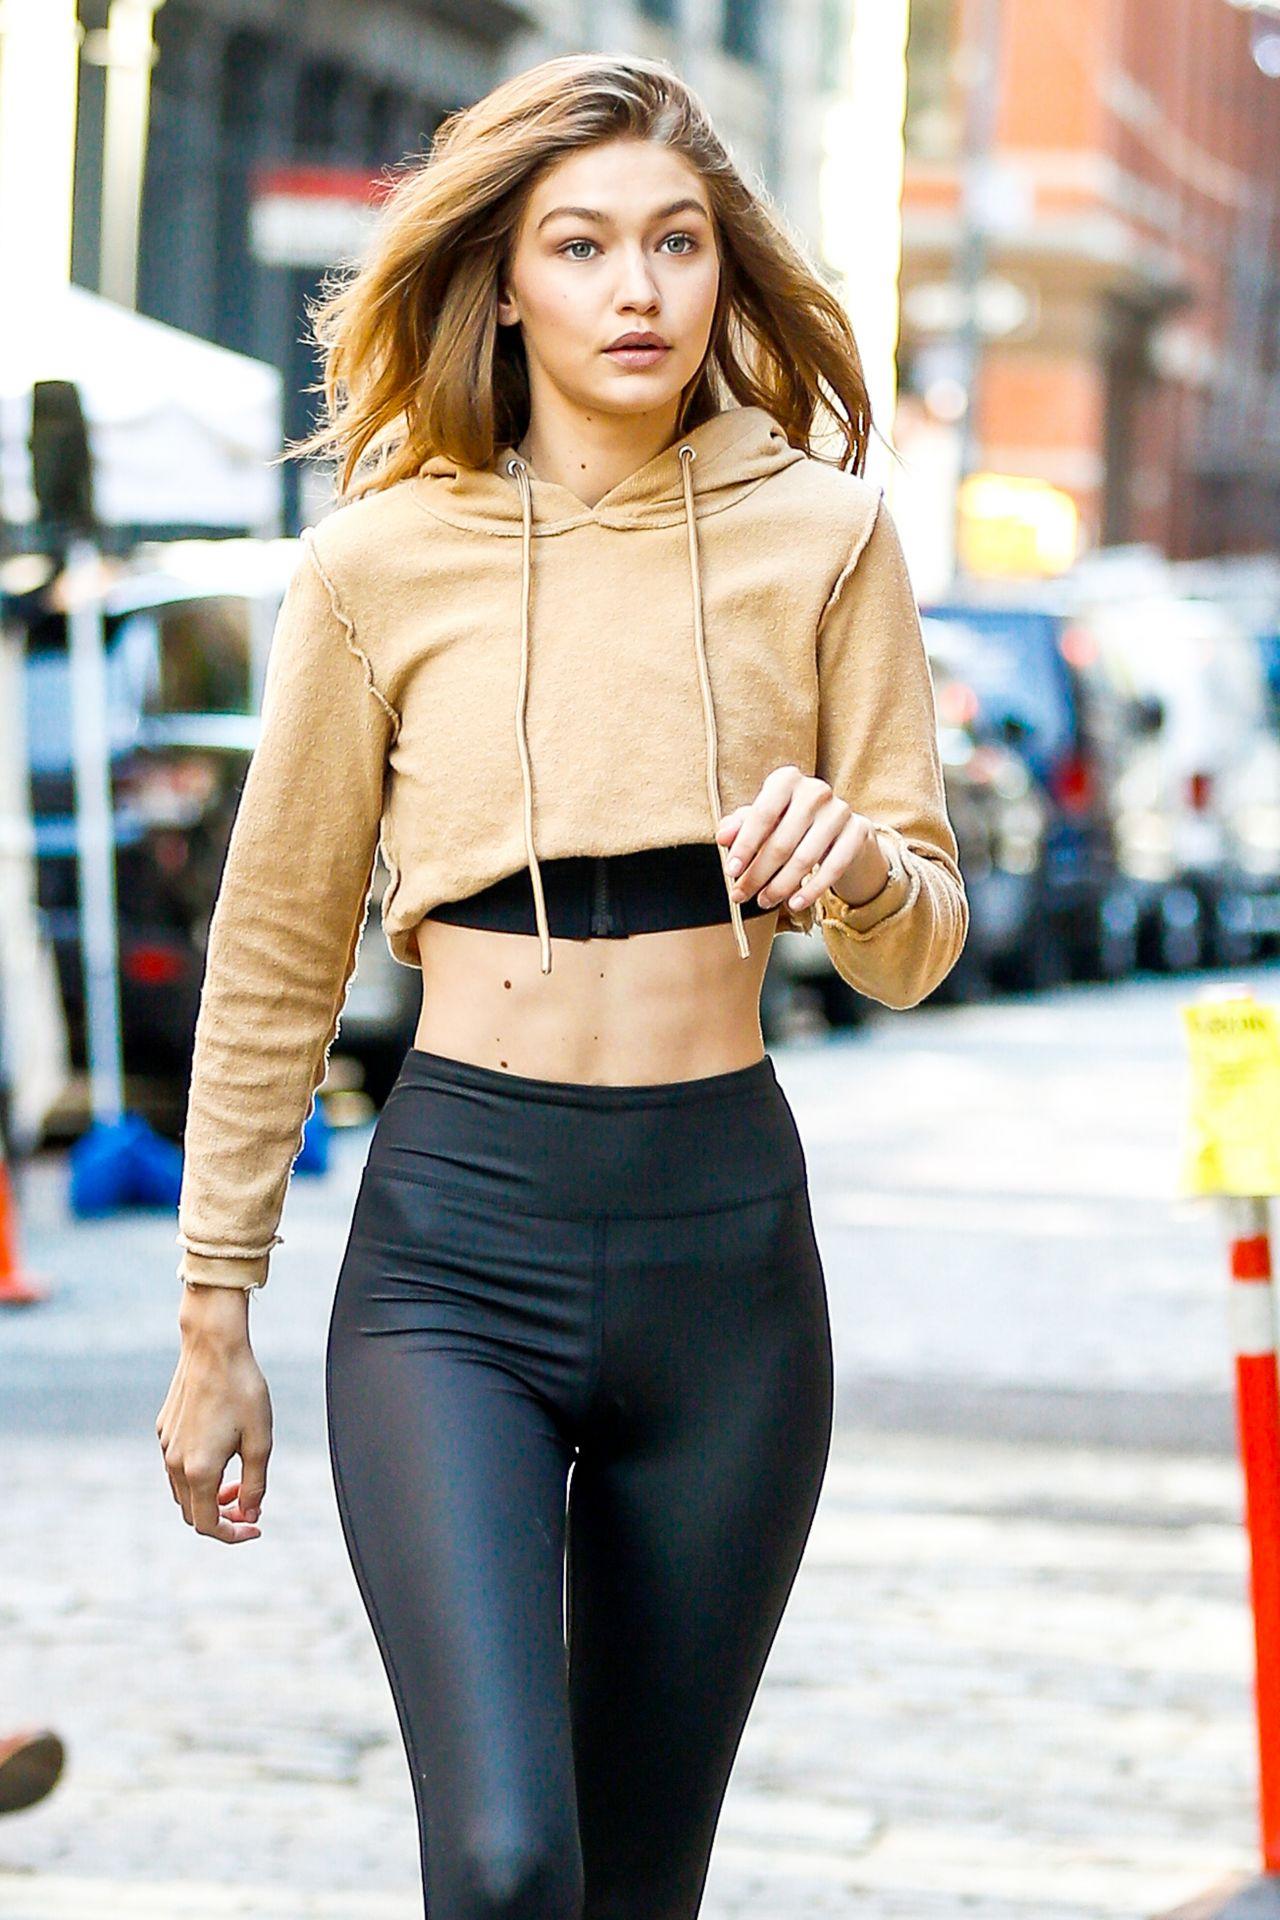 8013d858f7d Gigi Hadid Street Style - New York - 07 26 2016